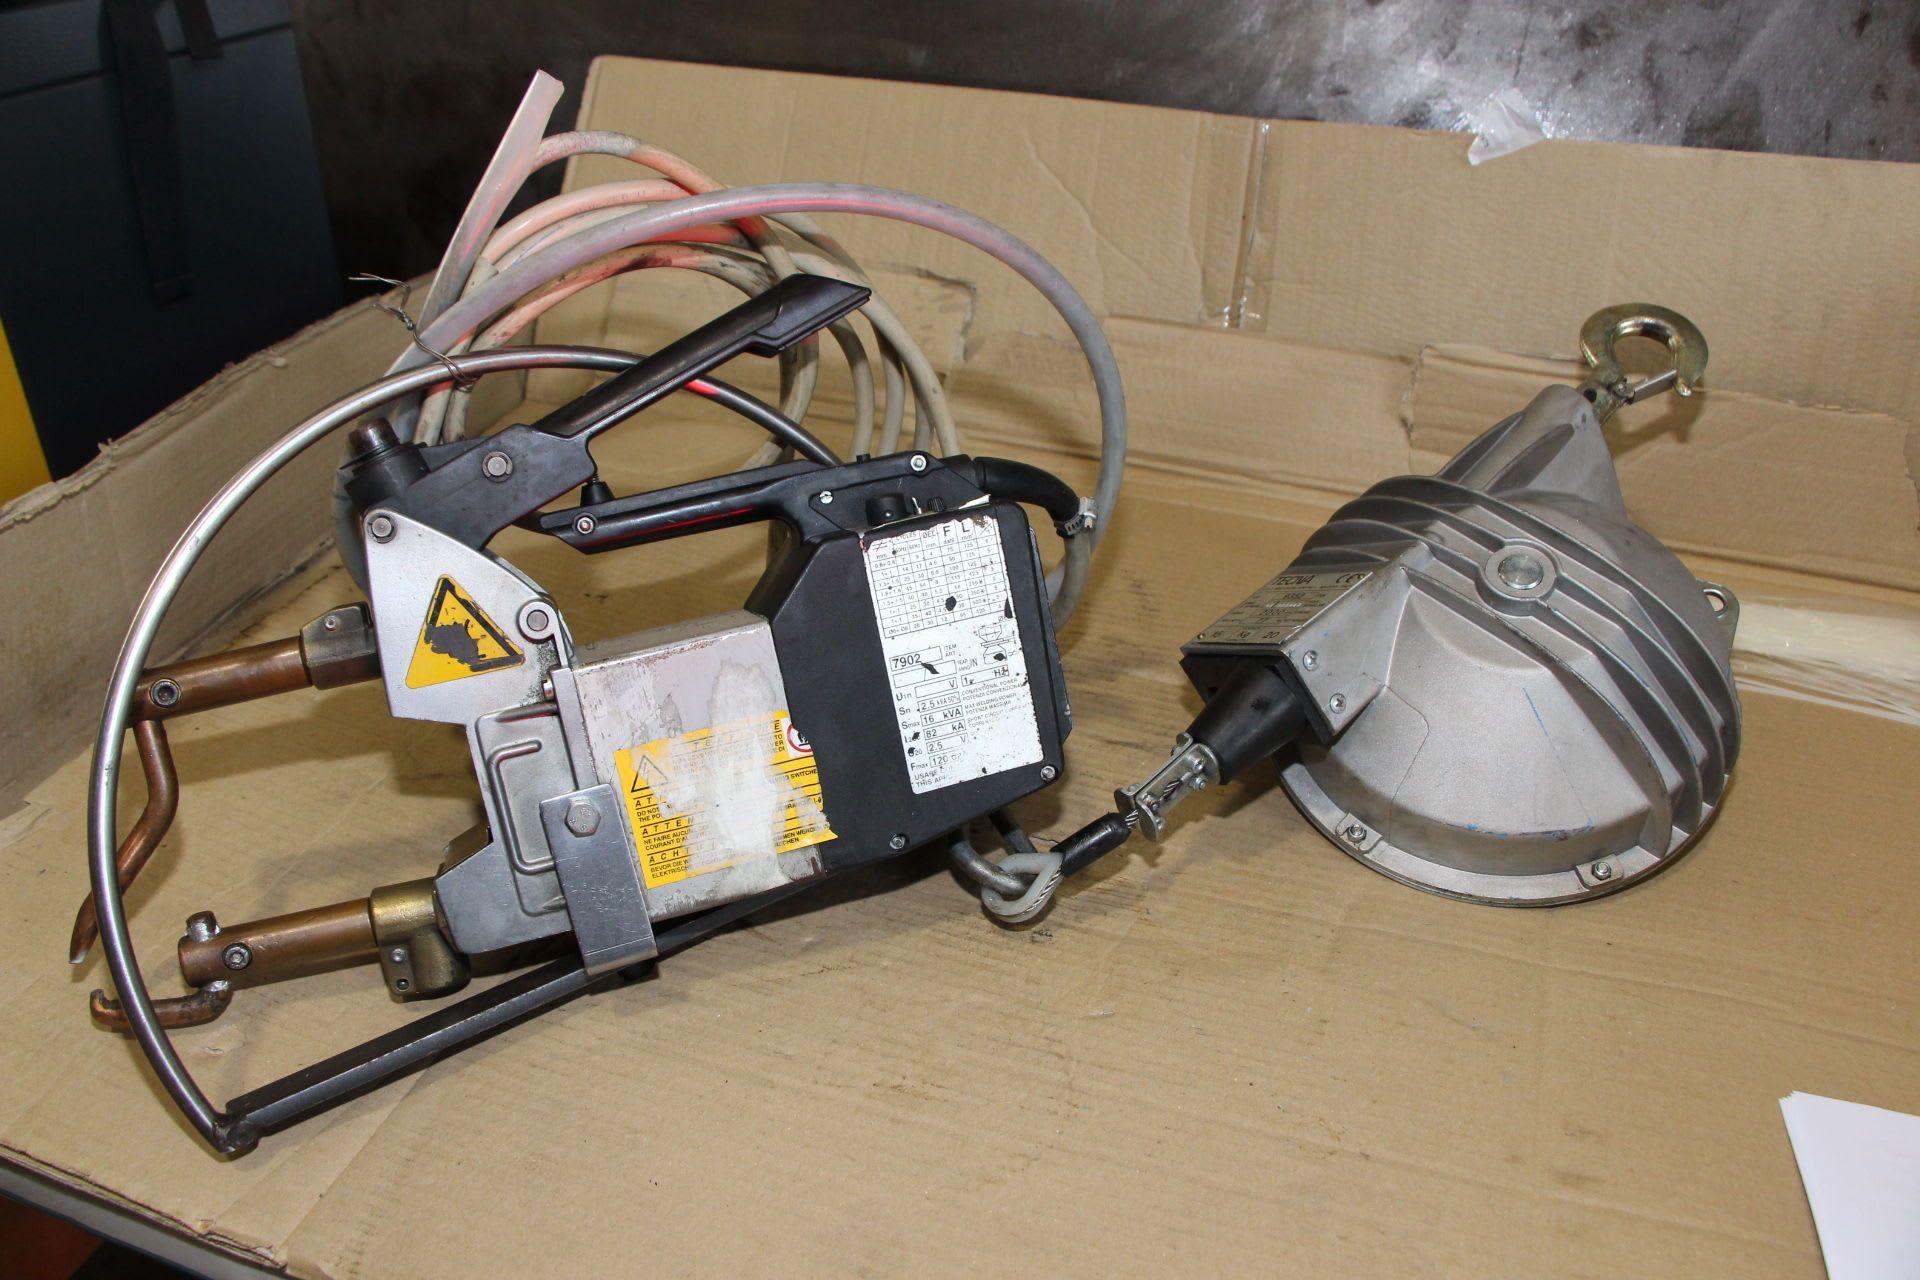 TECNA 7902 120 DAN Tragbares Punktschweißgerät